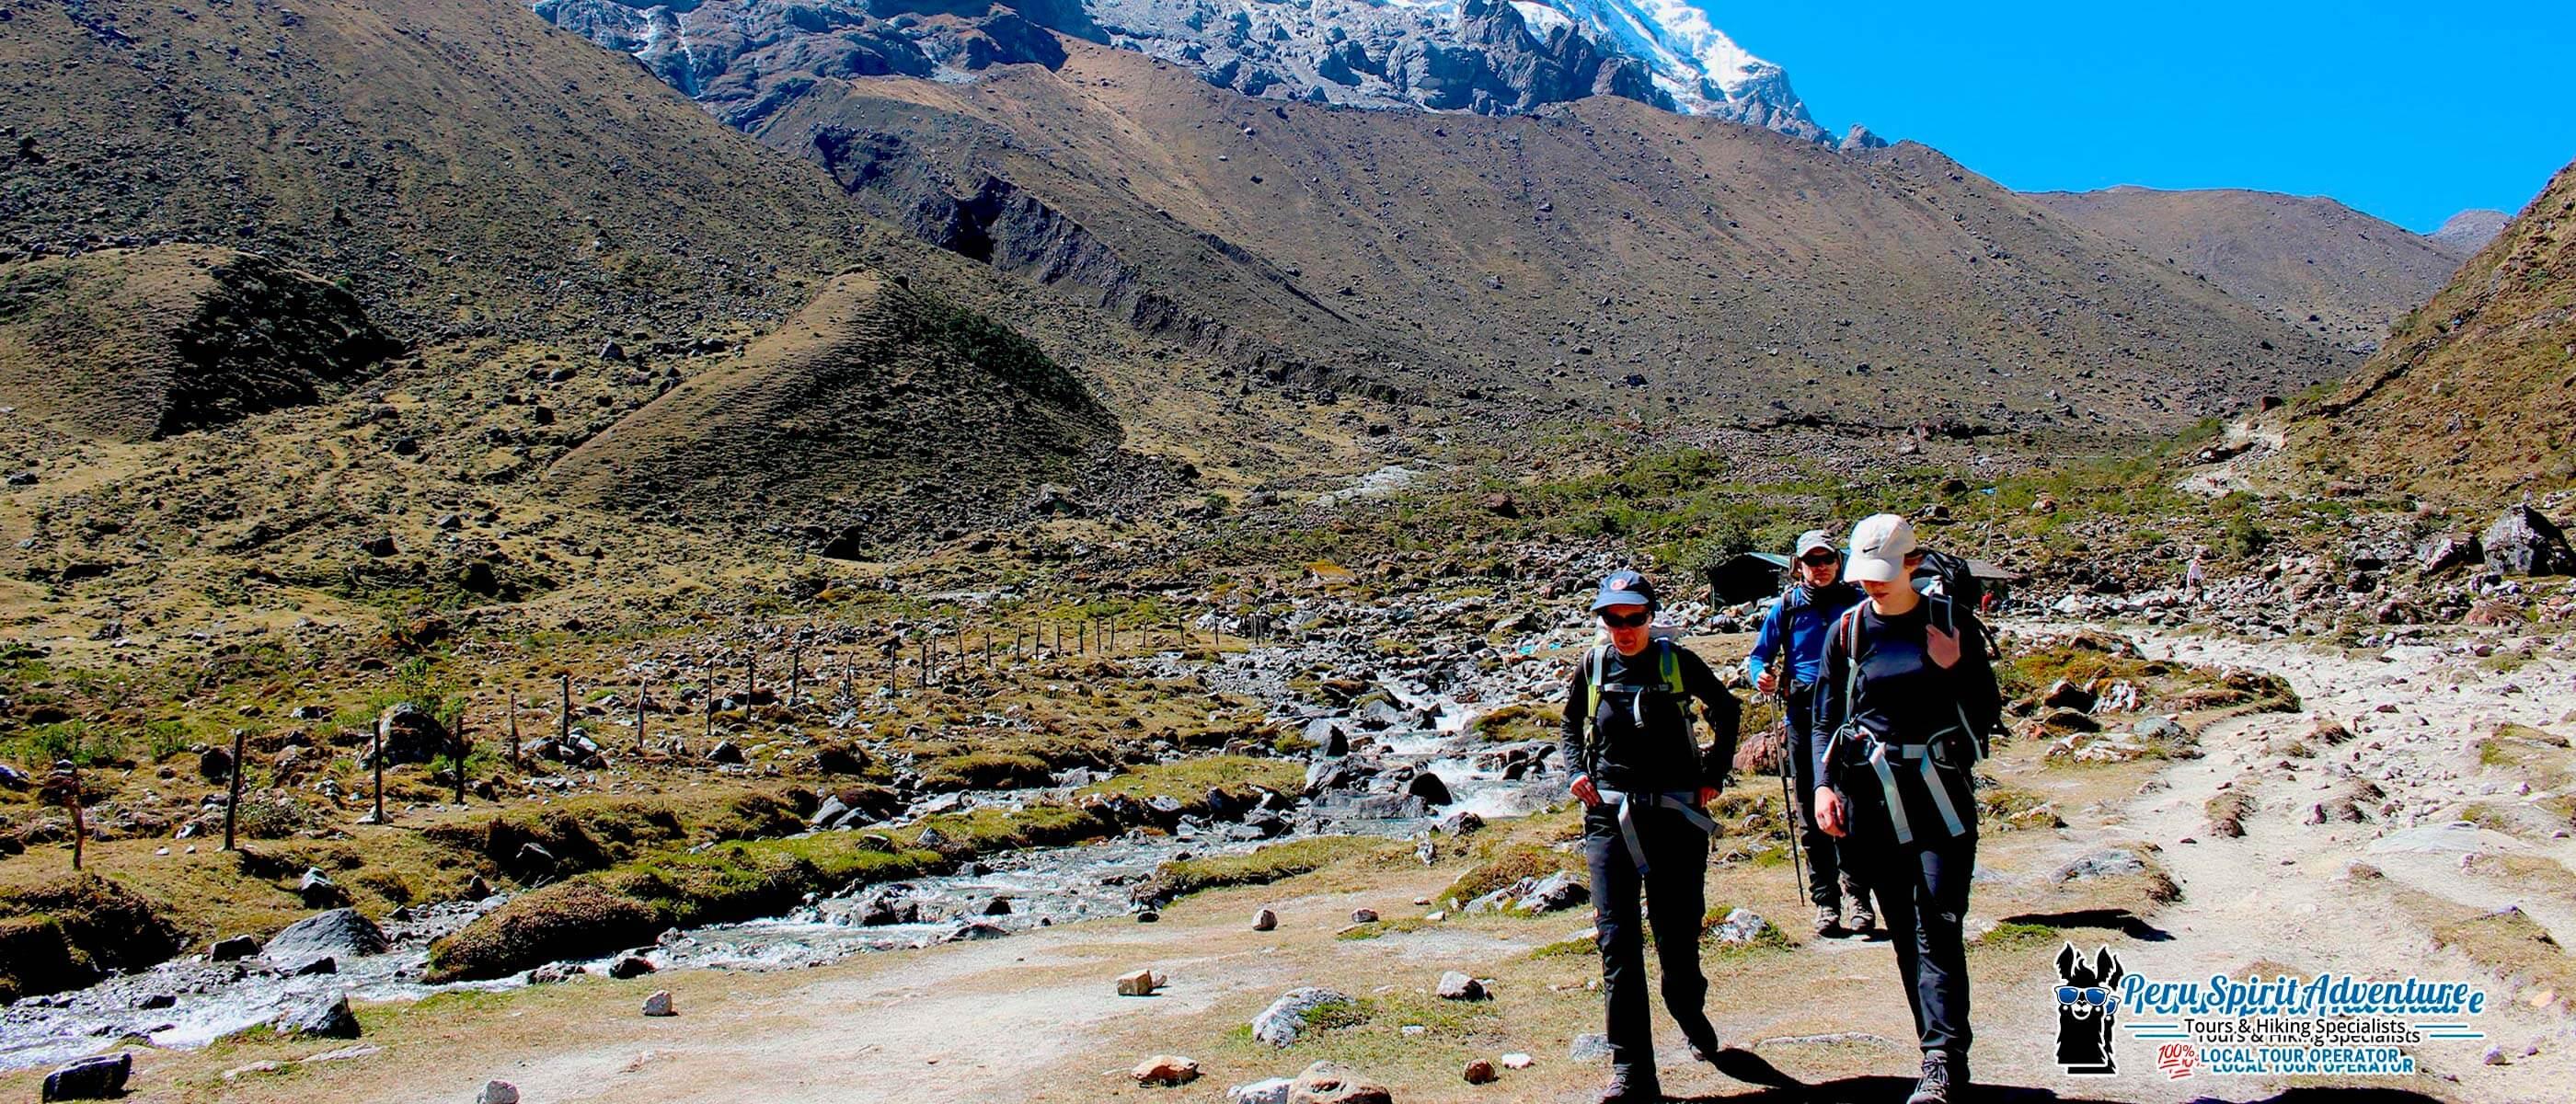 tour to Salkantay trail to Machu Picchu